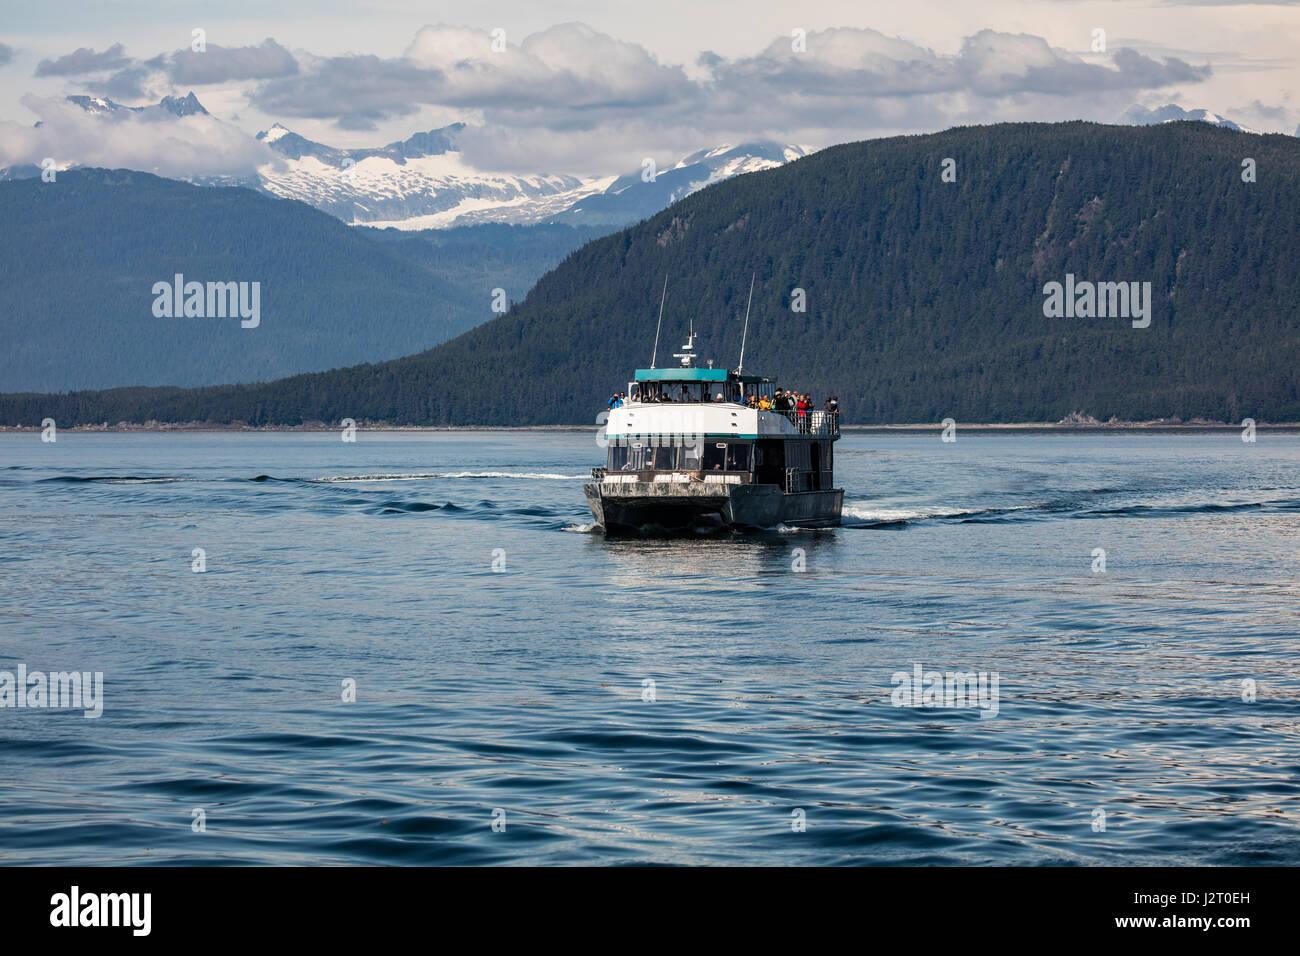 Ketchikan city harbor stock photos ketchikan city harbor for Alaska fishing boats